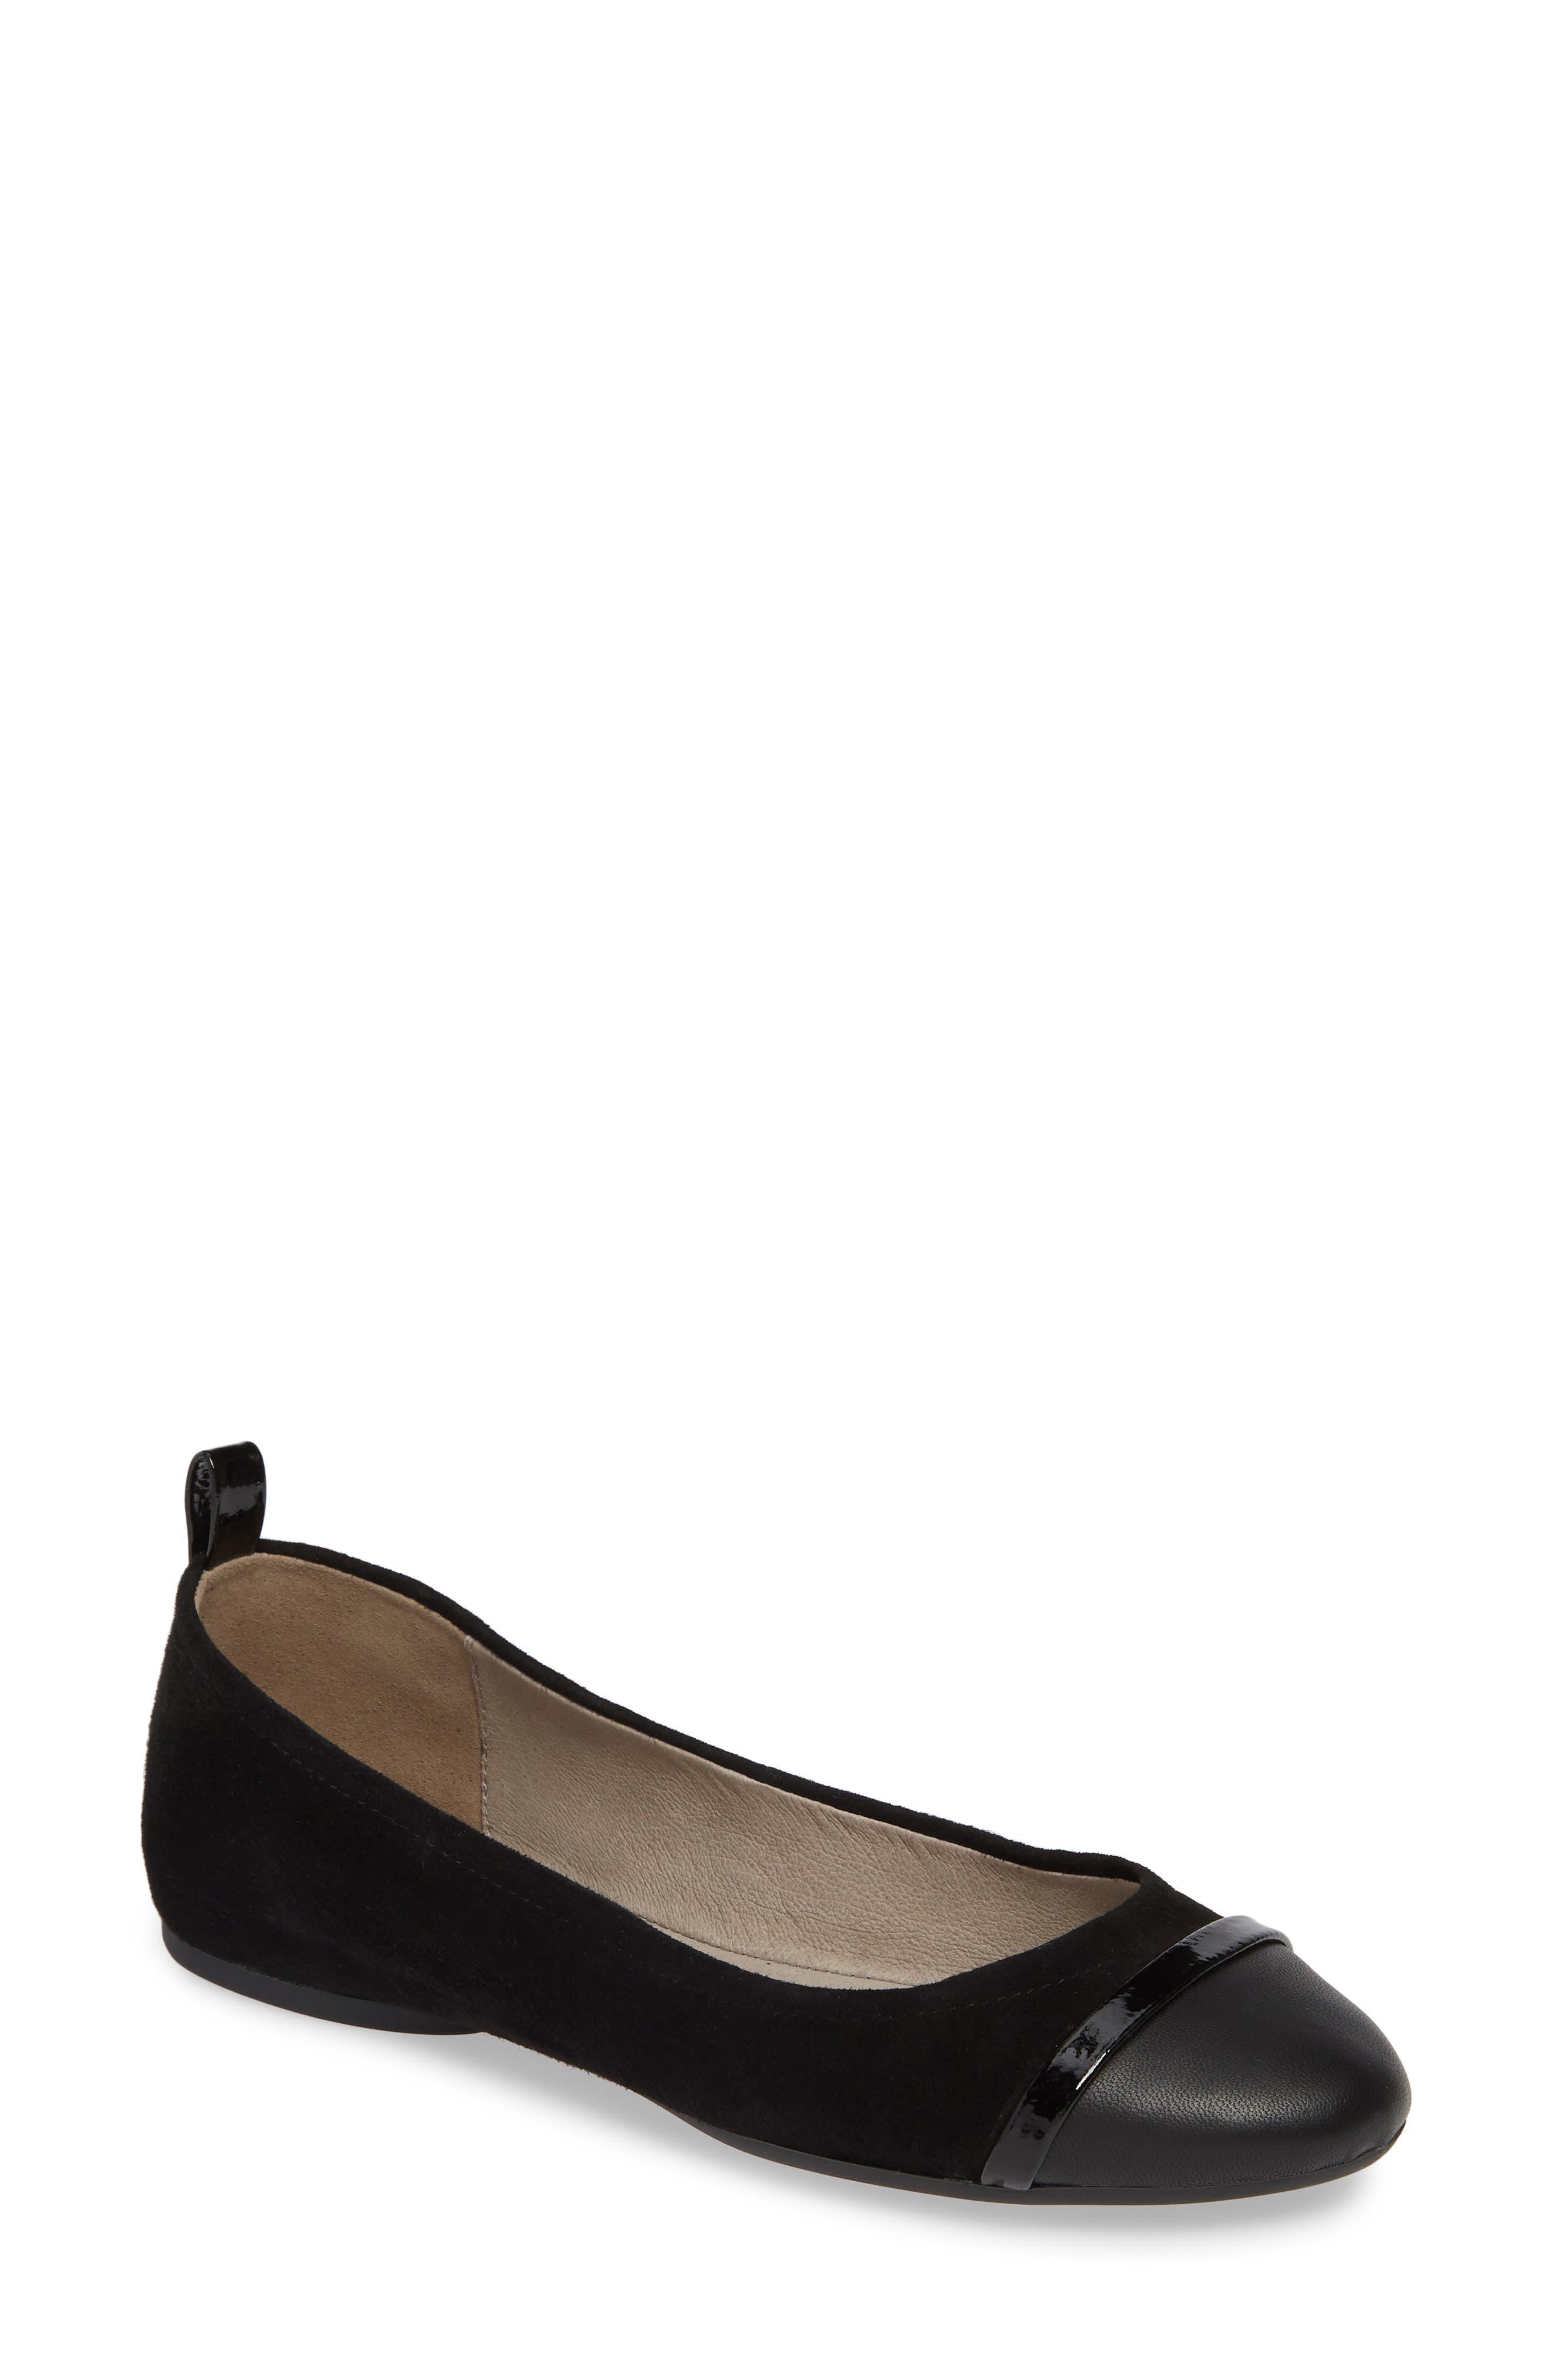 Pelle Moda Willis Cap Toe Flat- Black